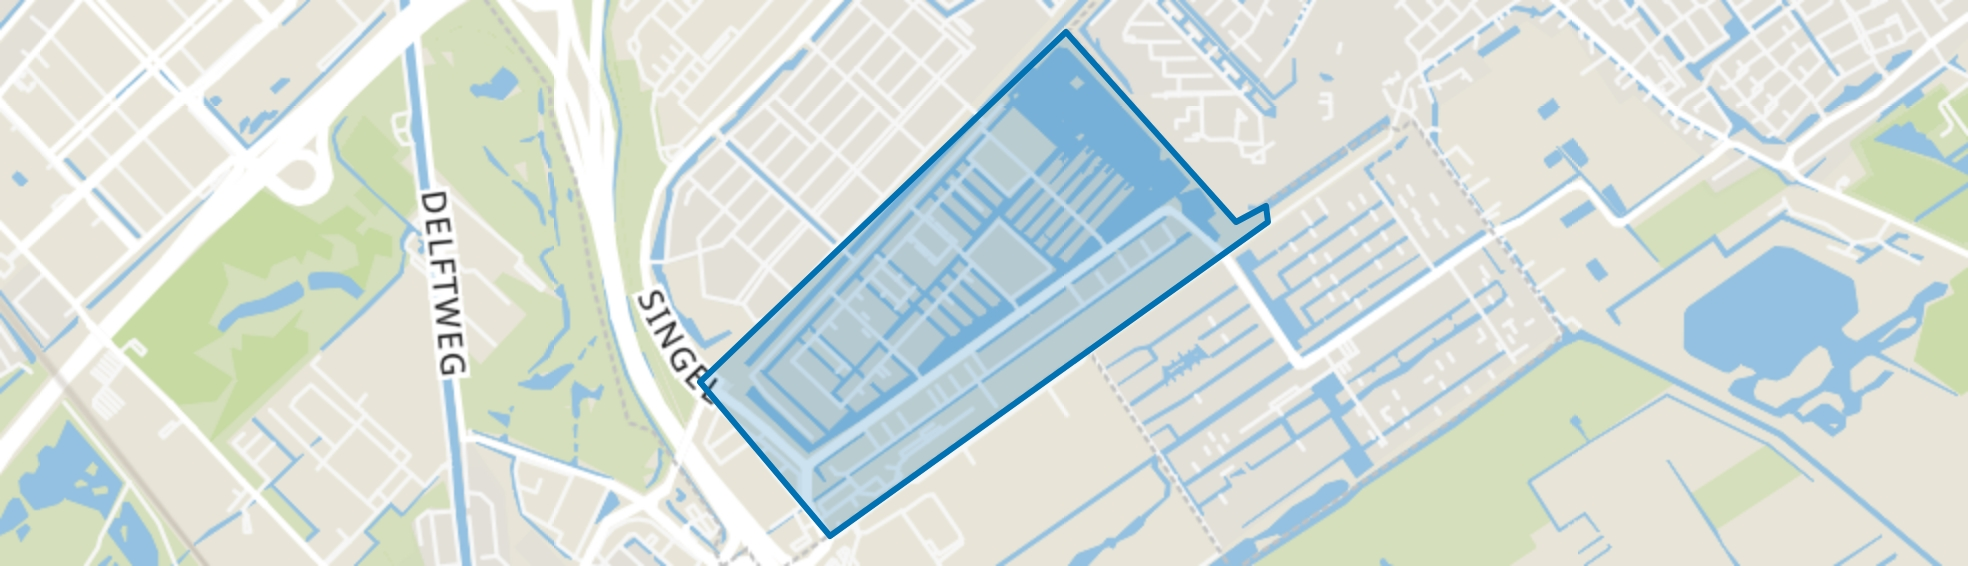 Waterbuurt, Den Haag map